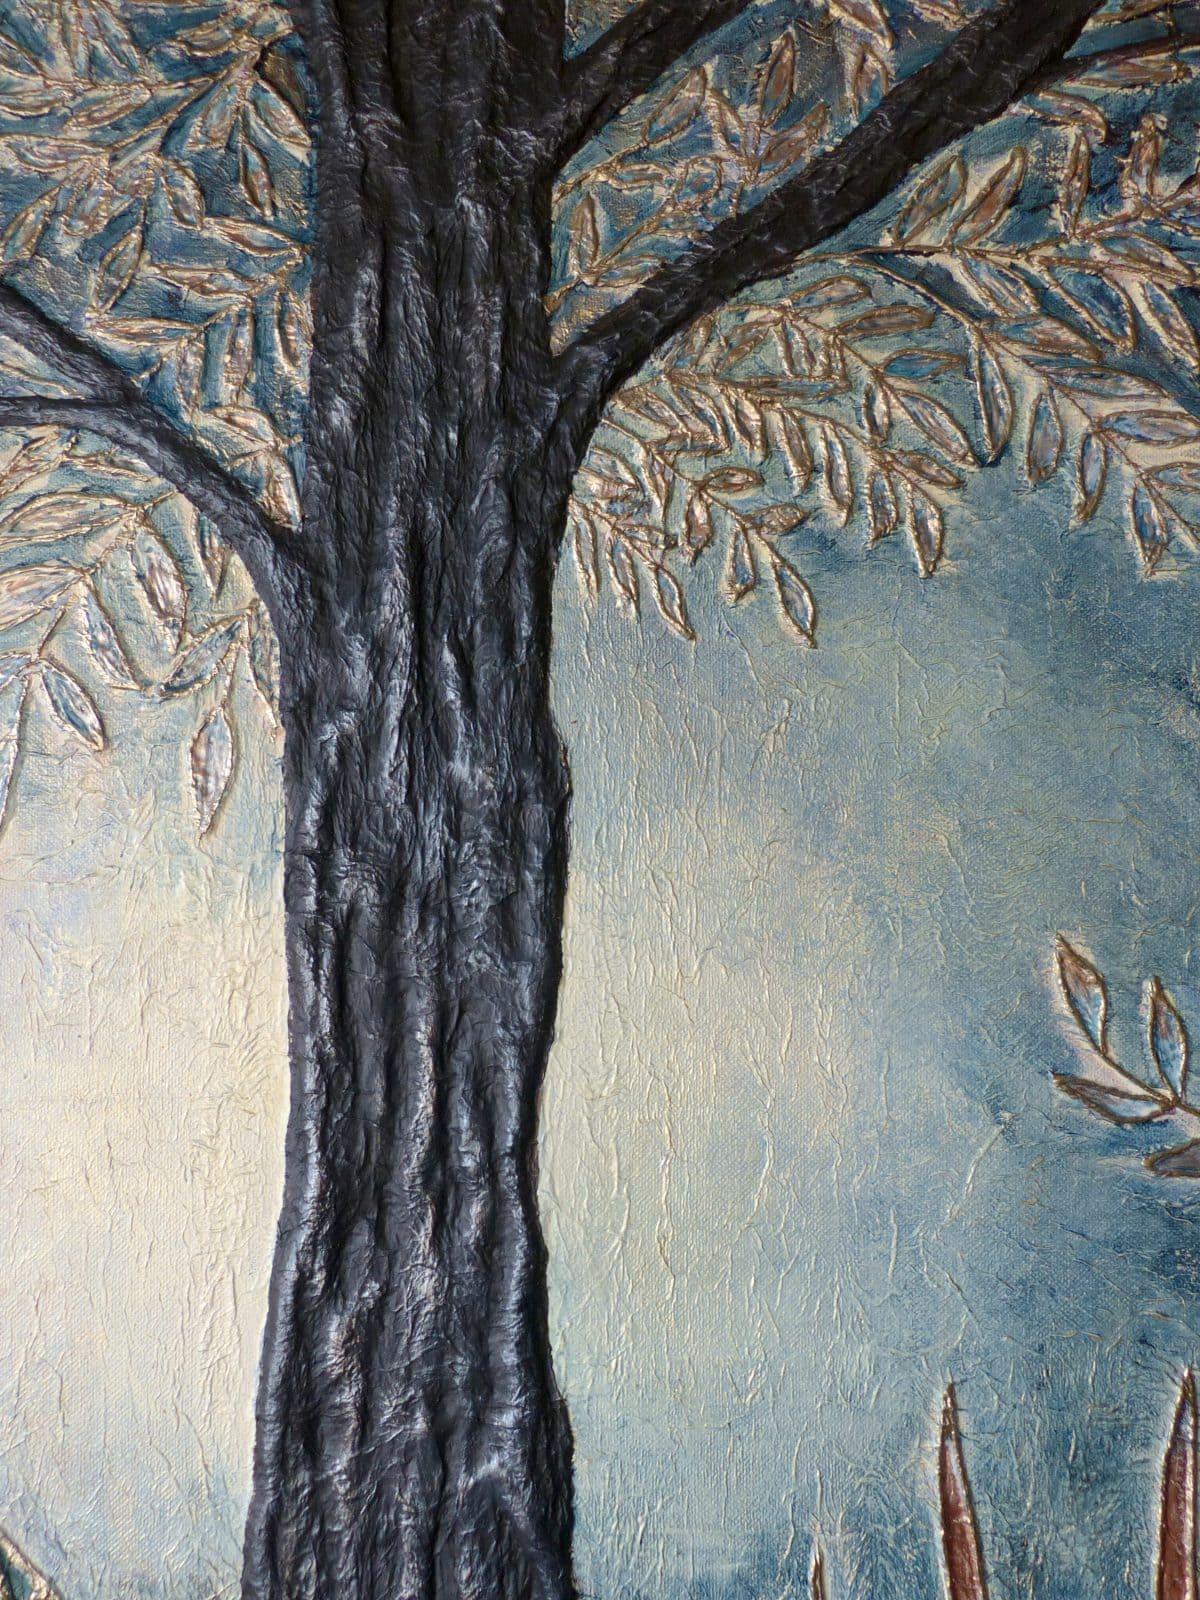 detail-tree-abundant-nature-2020-119x77cm-tiphanie-canada